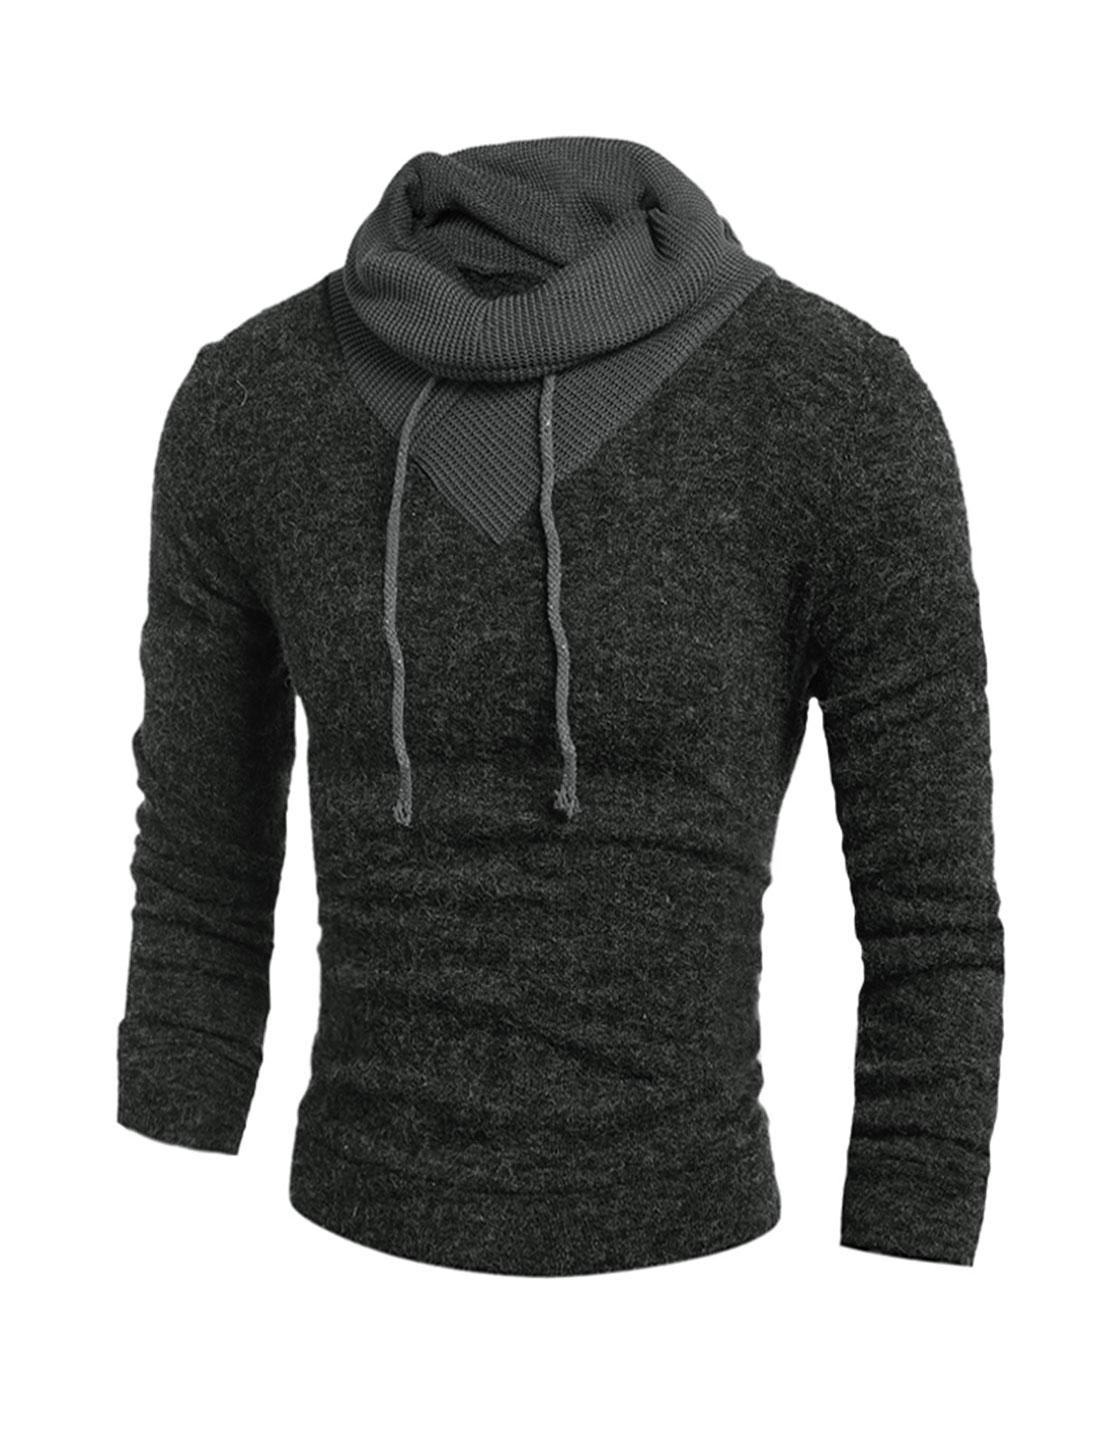 Man Drawstring Turtle Neck Knitted Shirt Dark Gray M